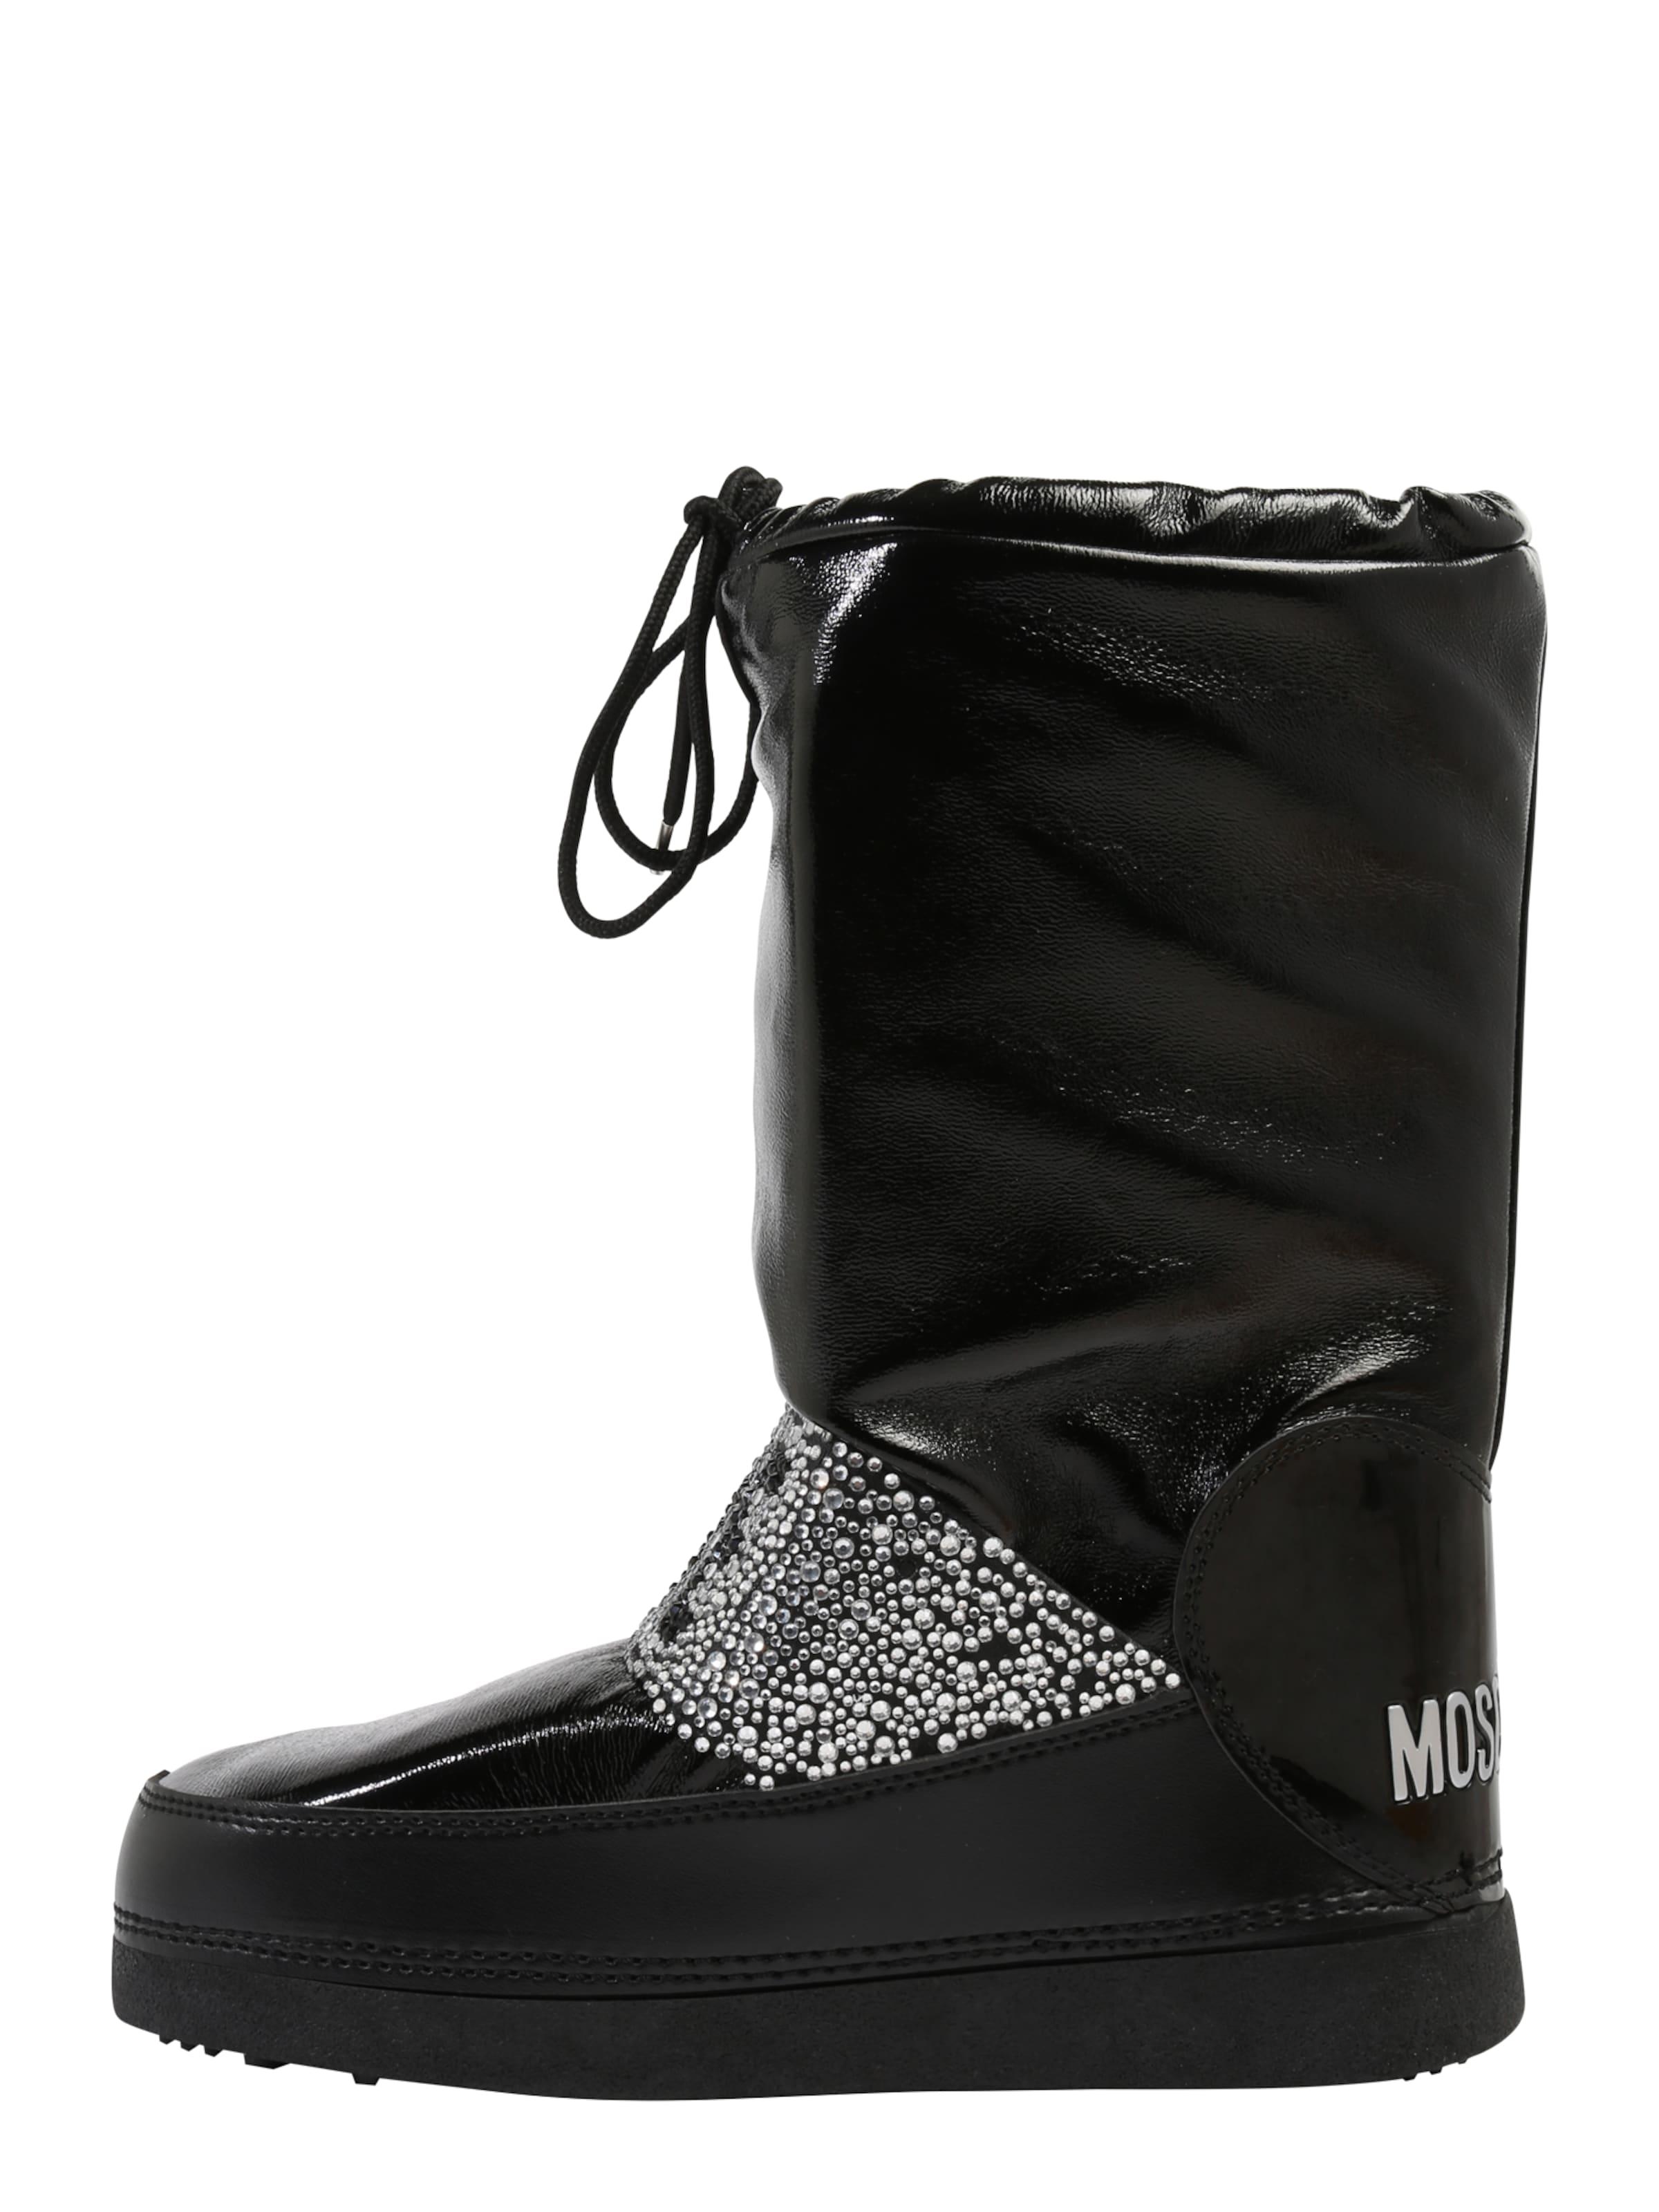 Noir En 'ski Boot' ski Moschino Après Love 4q3jLcRA5